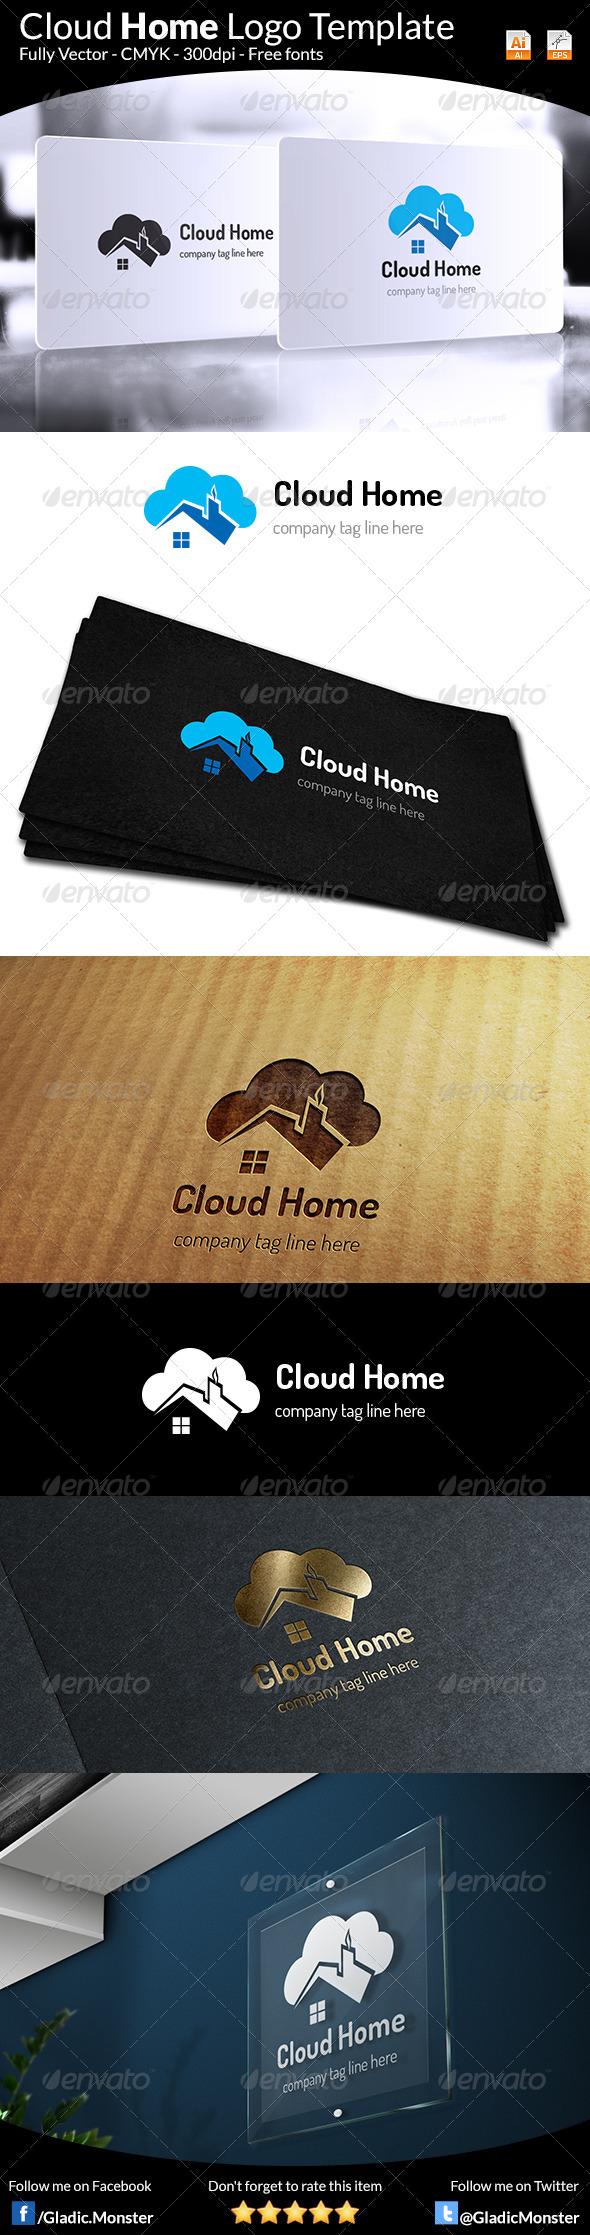 Cloud Home Real Estate Logo